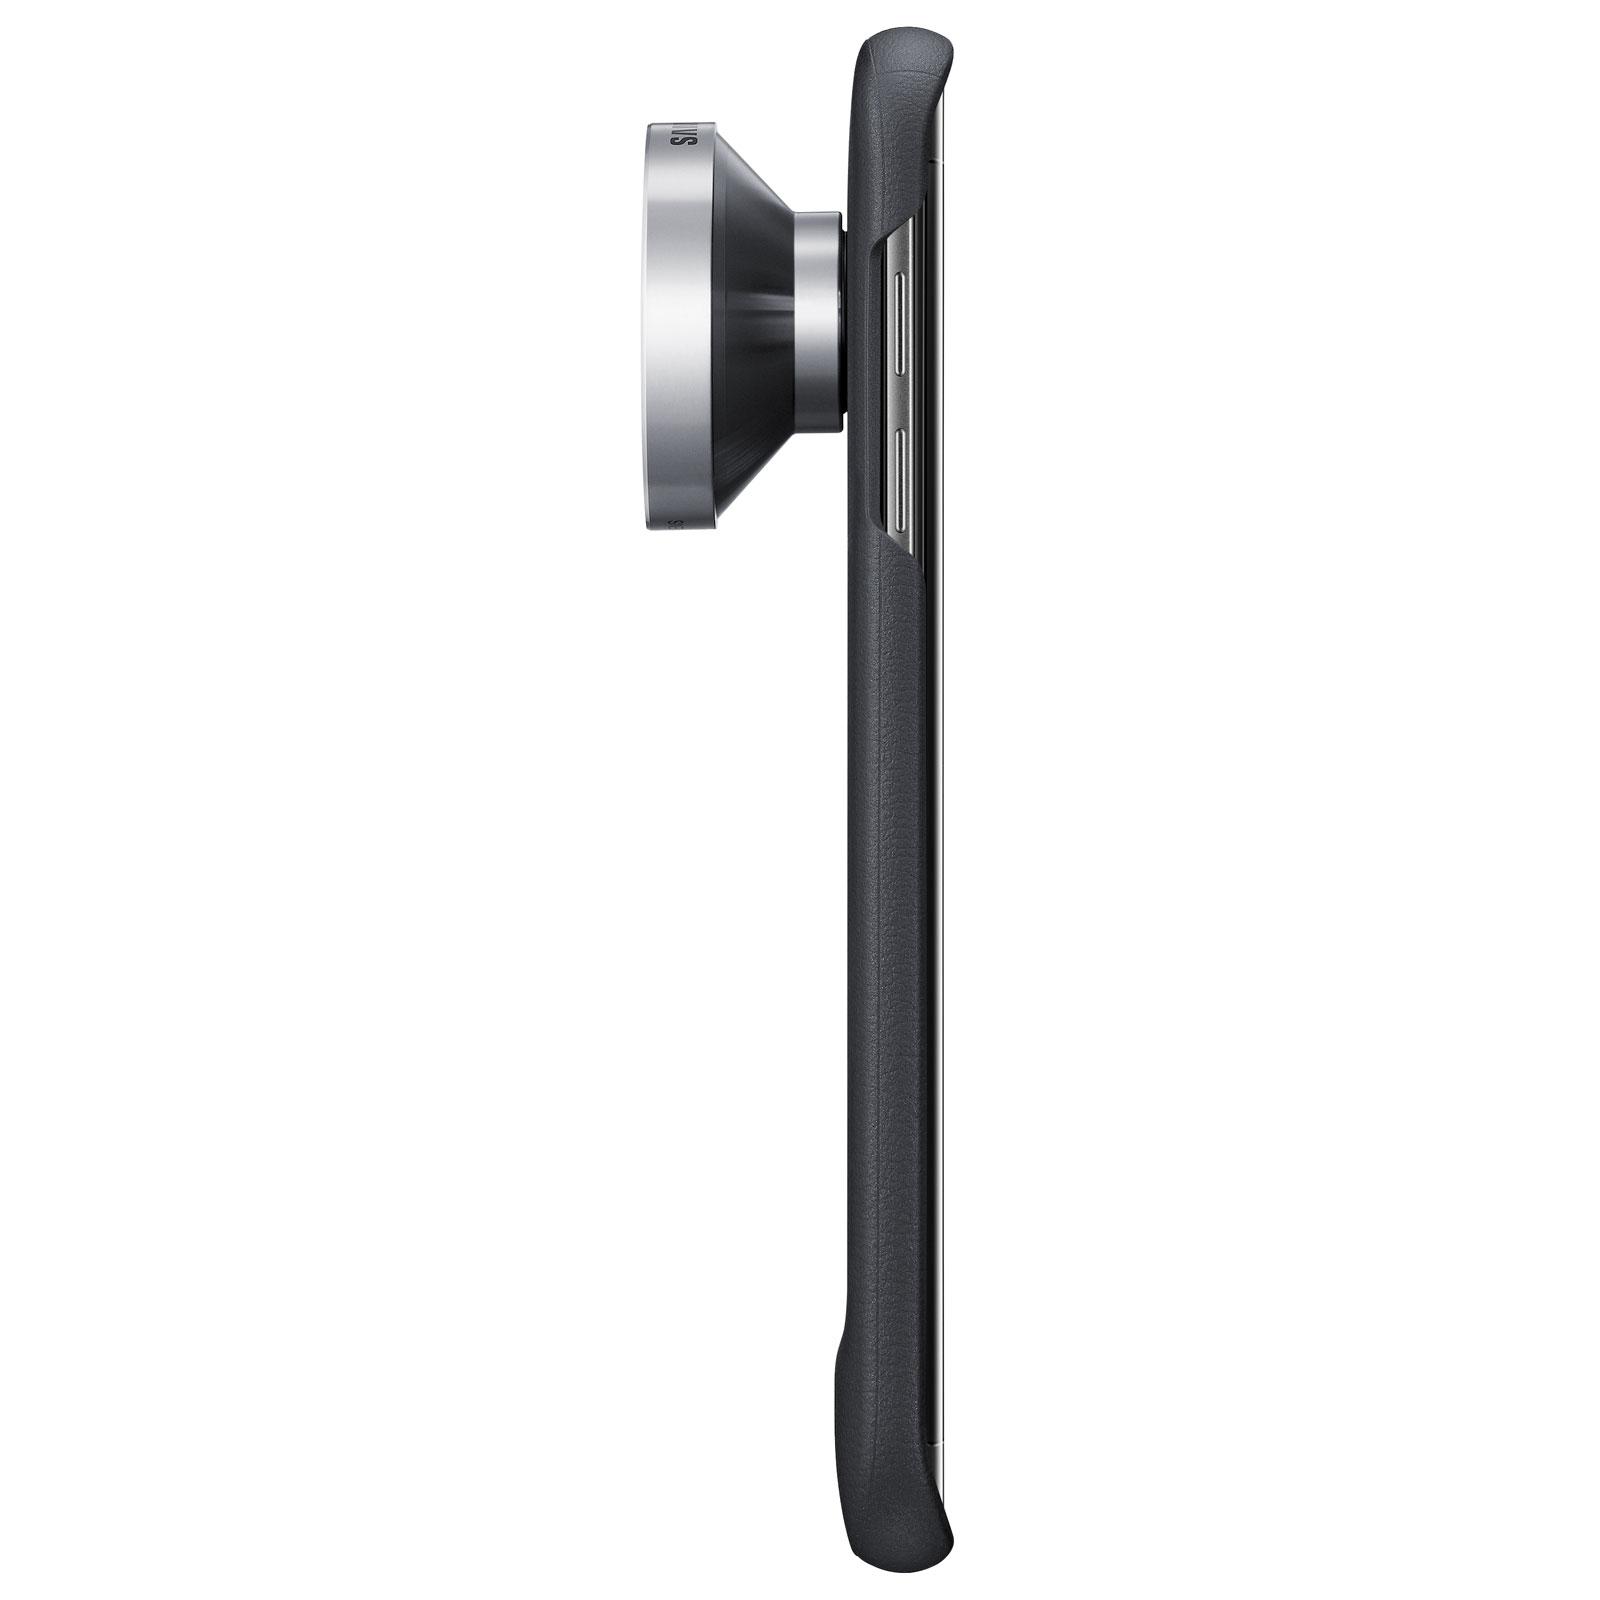 samsung lens cover noir samsung galaxy s7 edge etui t l phone samsung sur. Black Bedroom Furniture Sets. Home Design Ideas